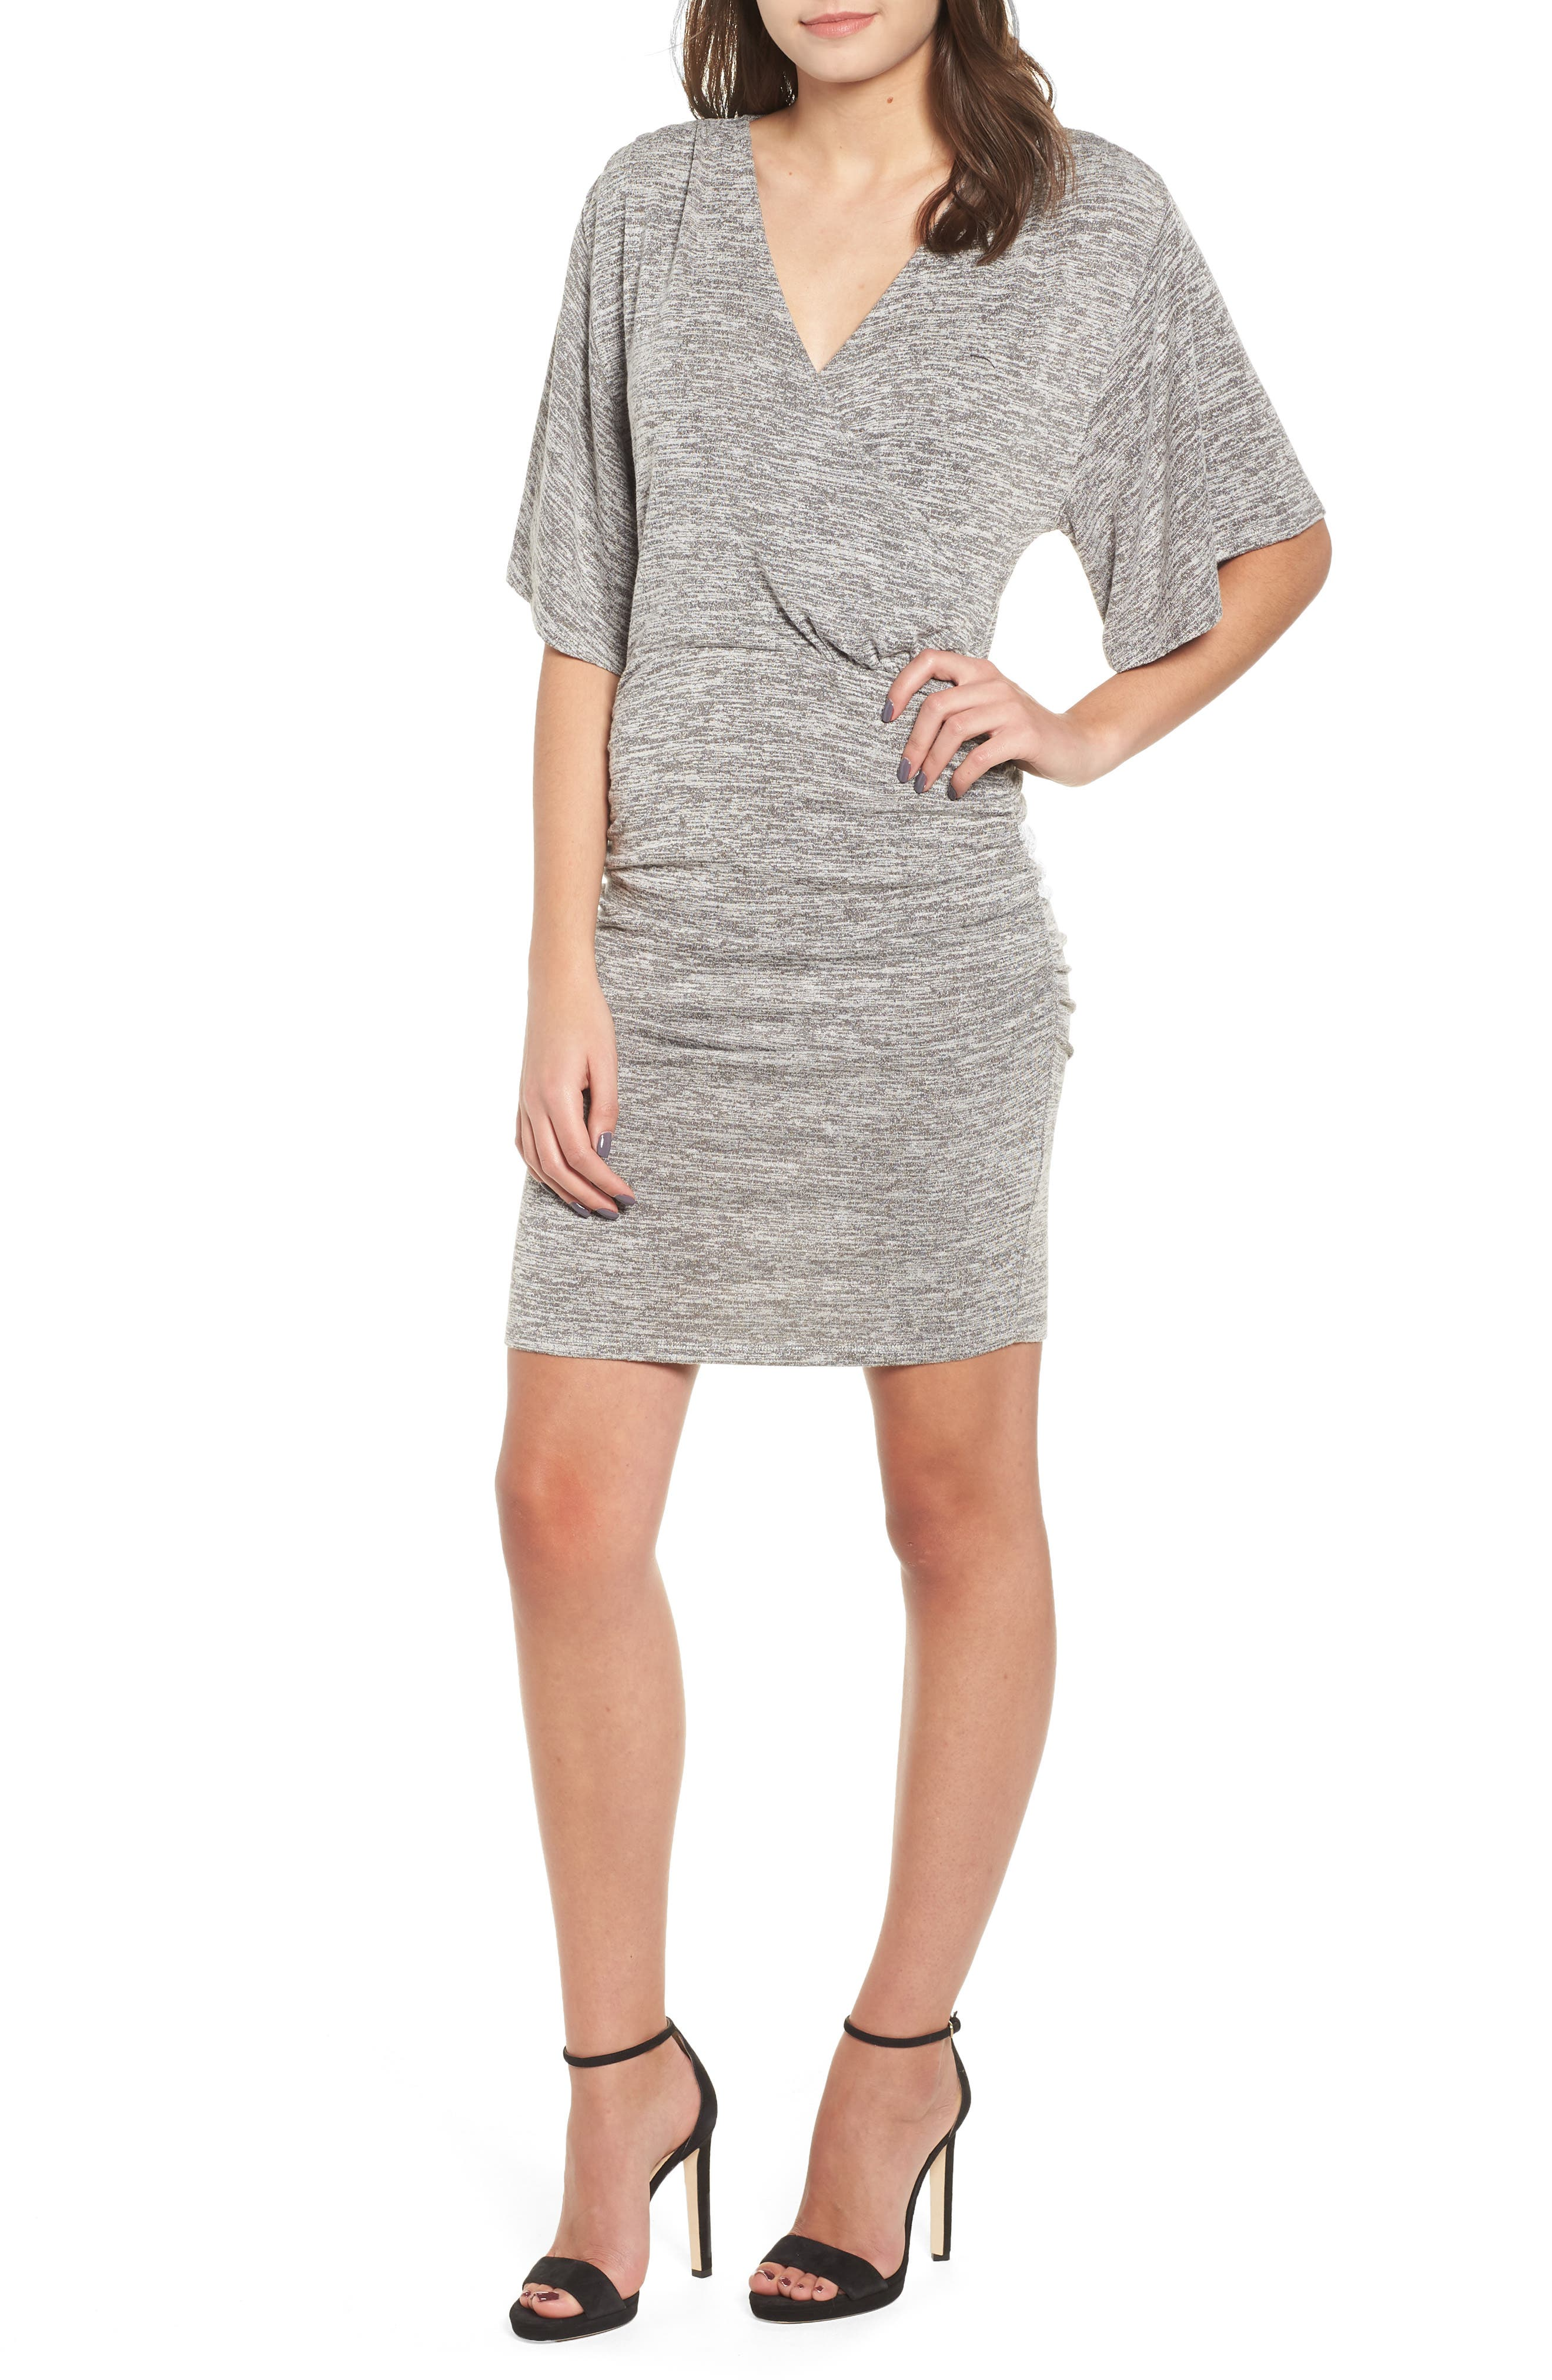 Wrap Dress,                         Main,                         color, GREY CLOUDY HEATHER